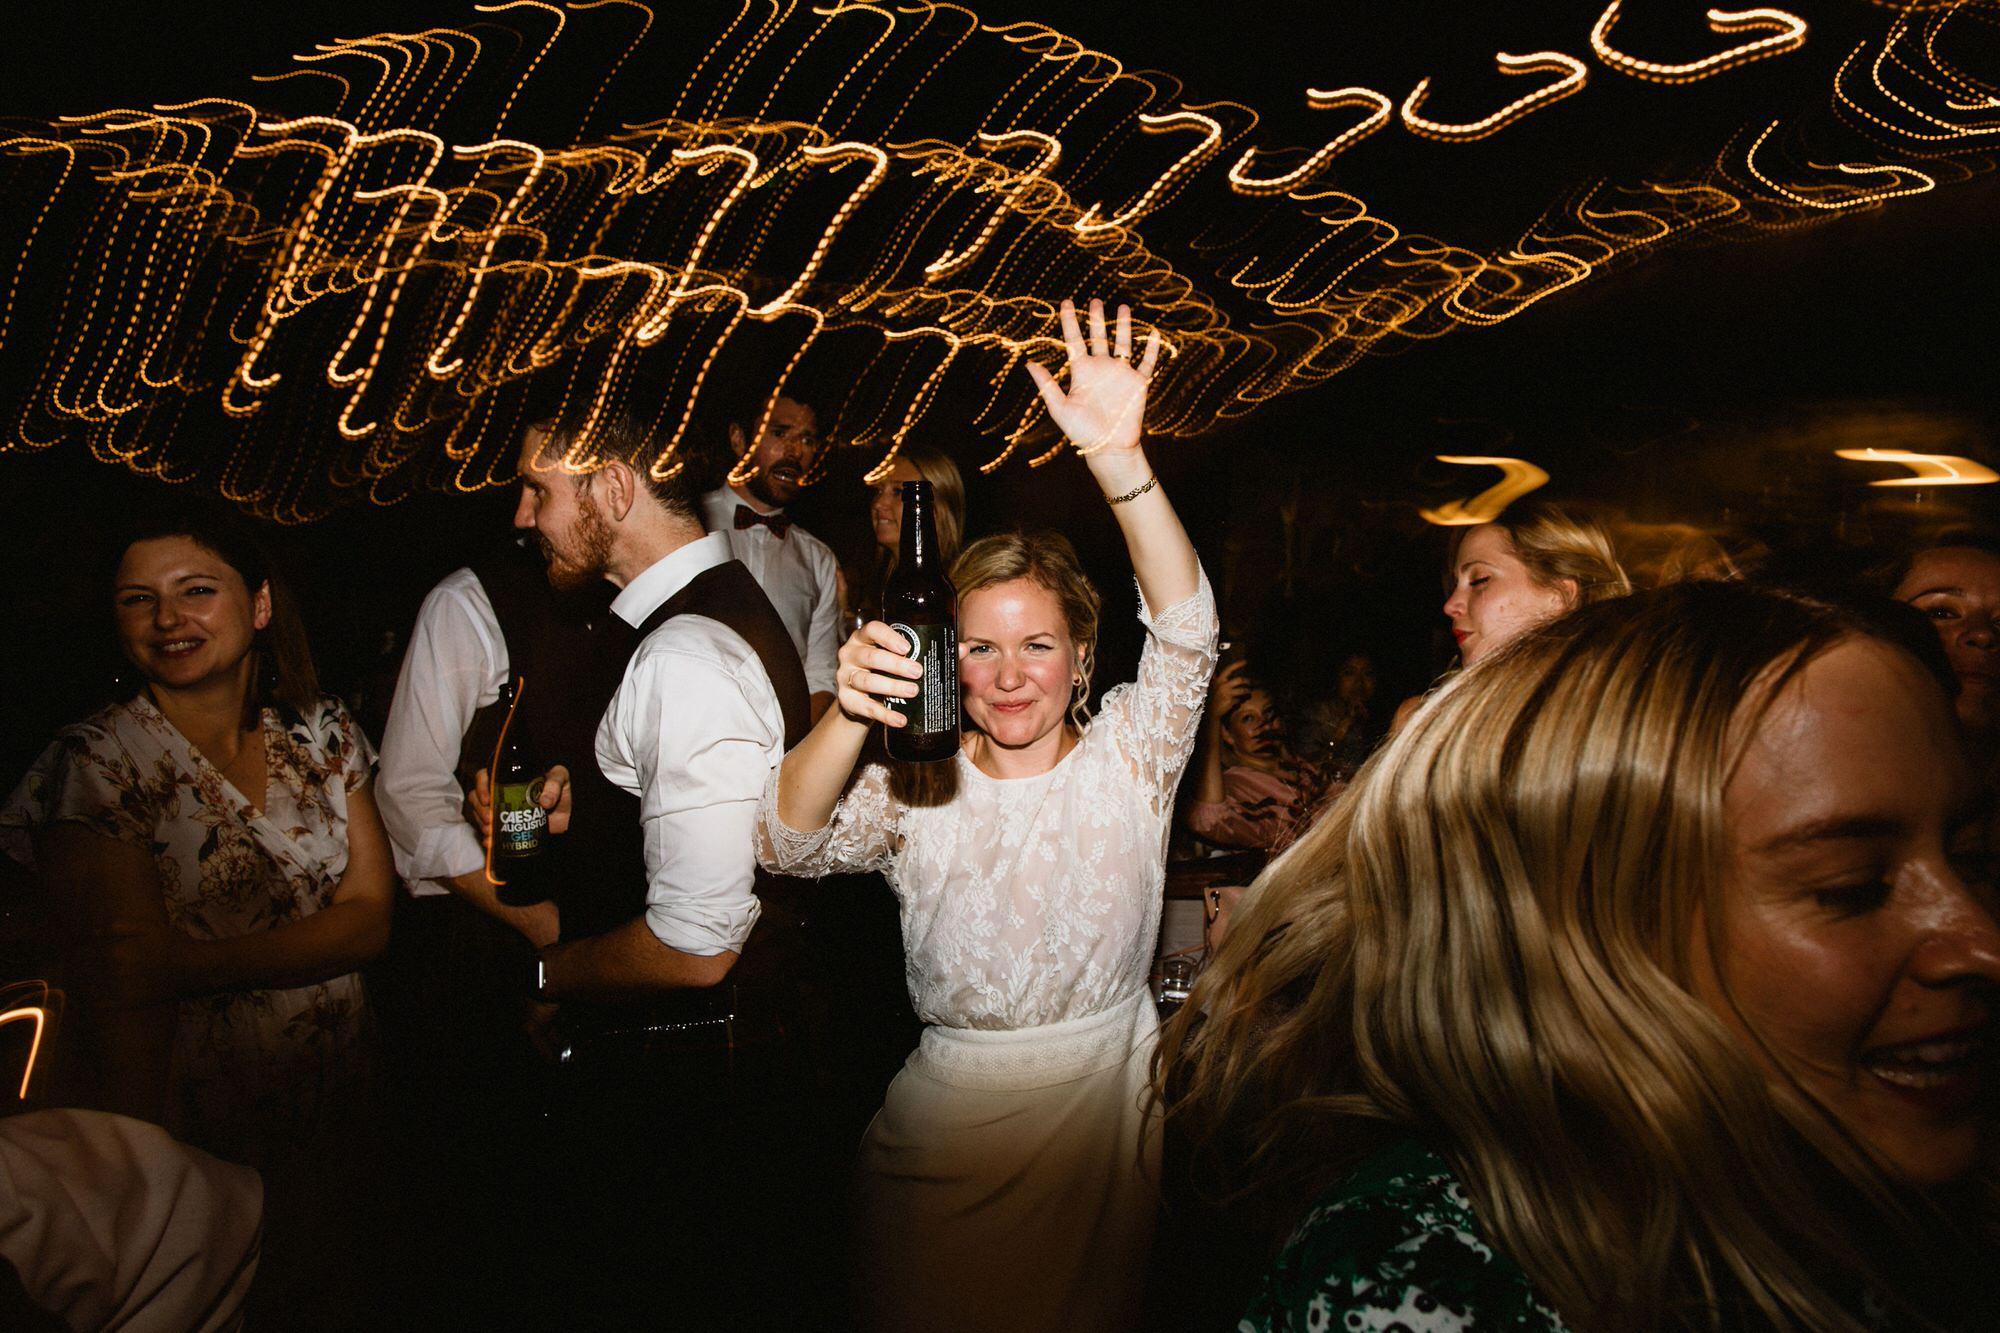 081 TIN SHED KNOCKRAICH WEDDING AUTUMN ZOE ALEXANDRA PHOTOGRAPHY